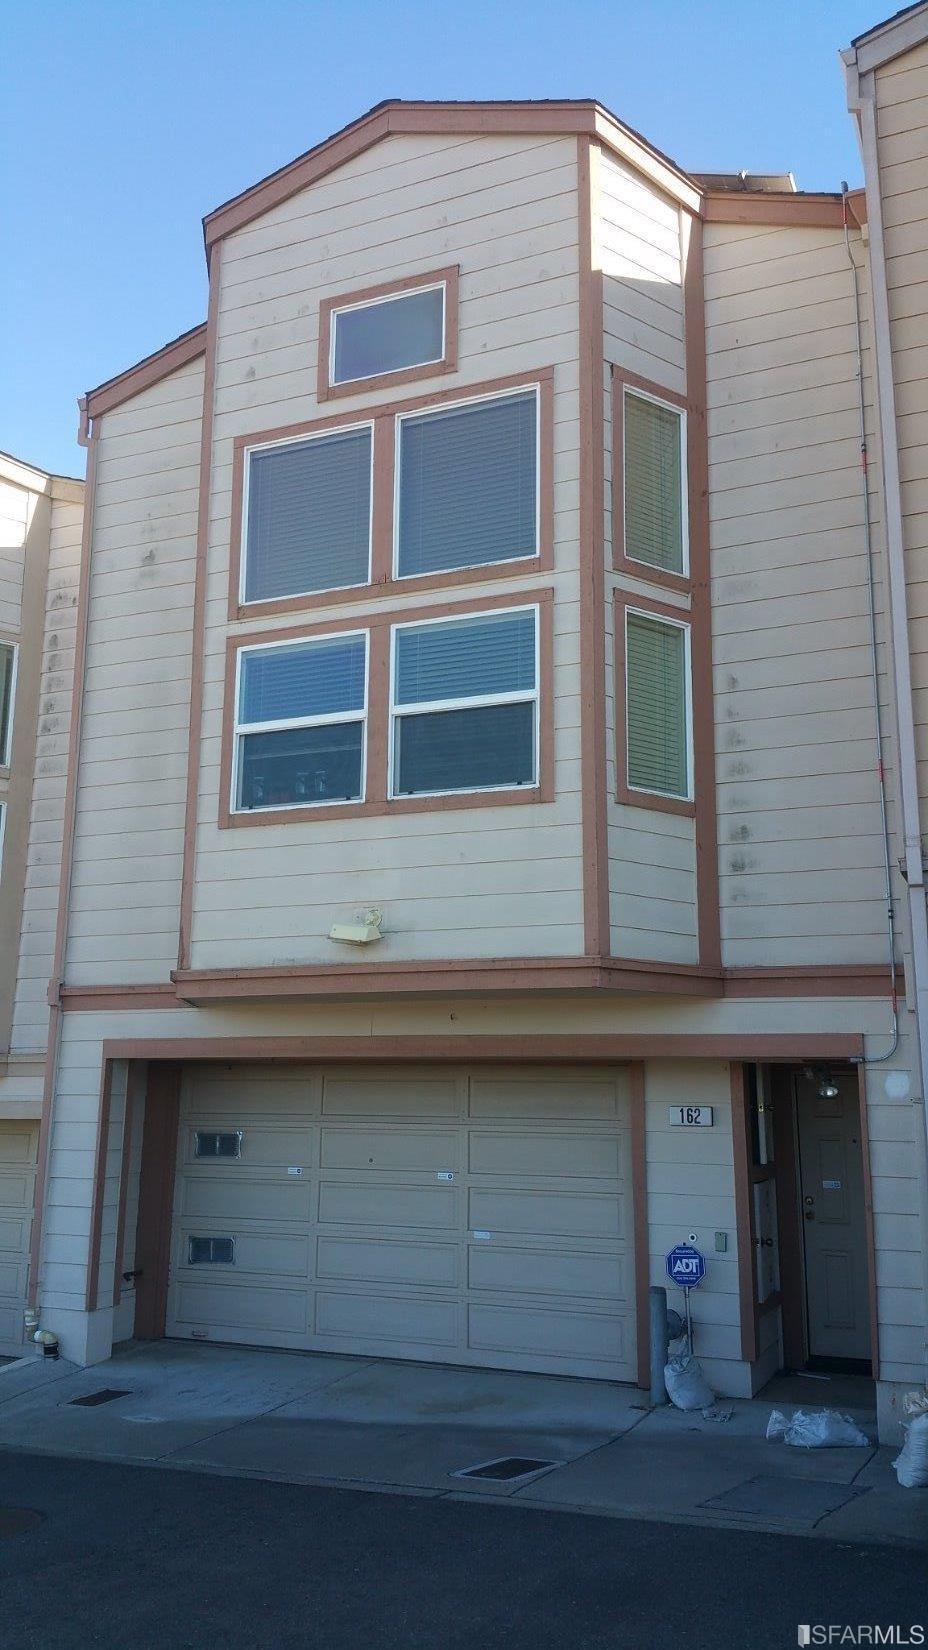 162 Alexander Ave, Daly City, CA 94014